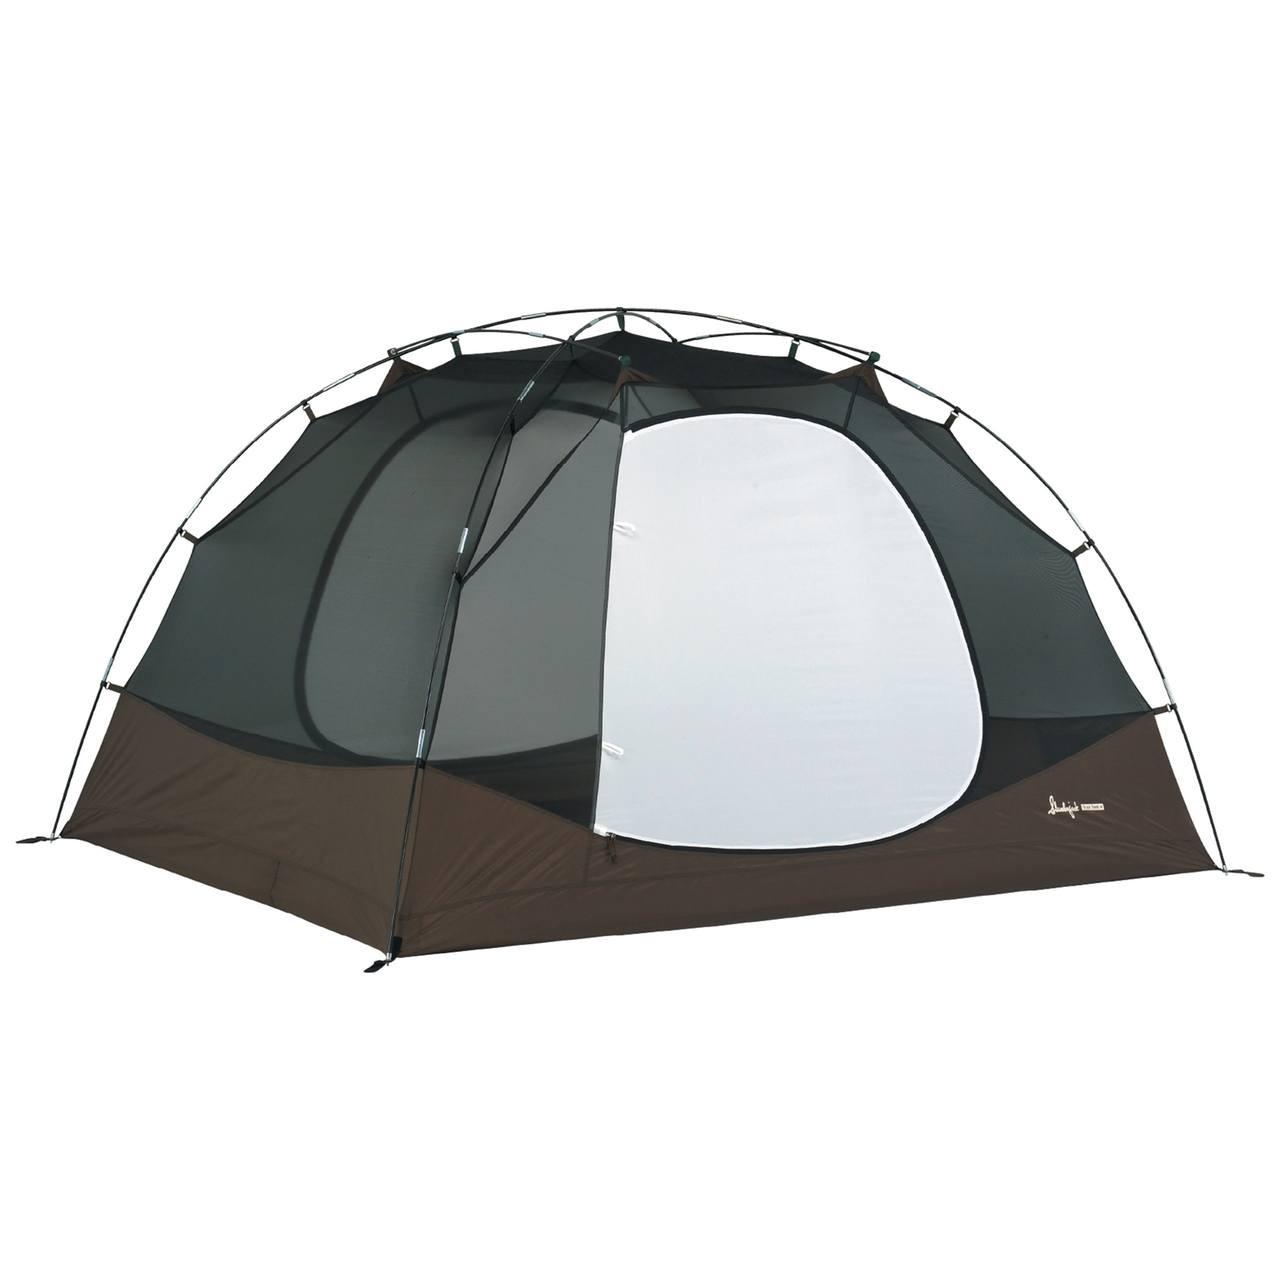 ... Trail Tent 6-Person Tent. Image 1  sc 1 st  Slumberjack & Slumberjack Trail Tent 6 | Car Camping 6-Person Tent | Camping